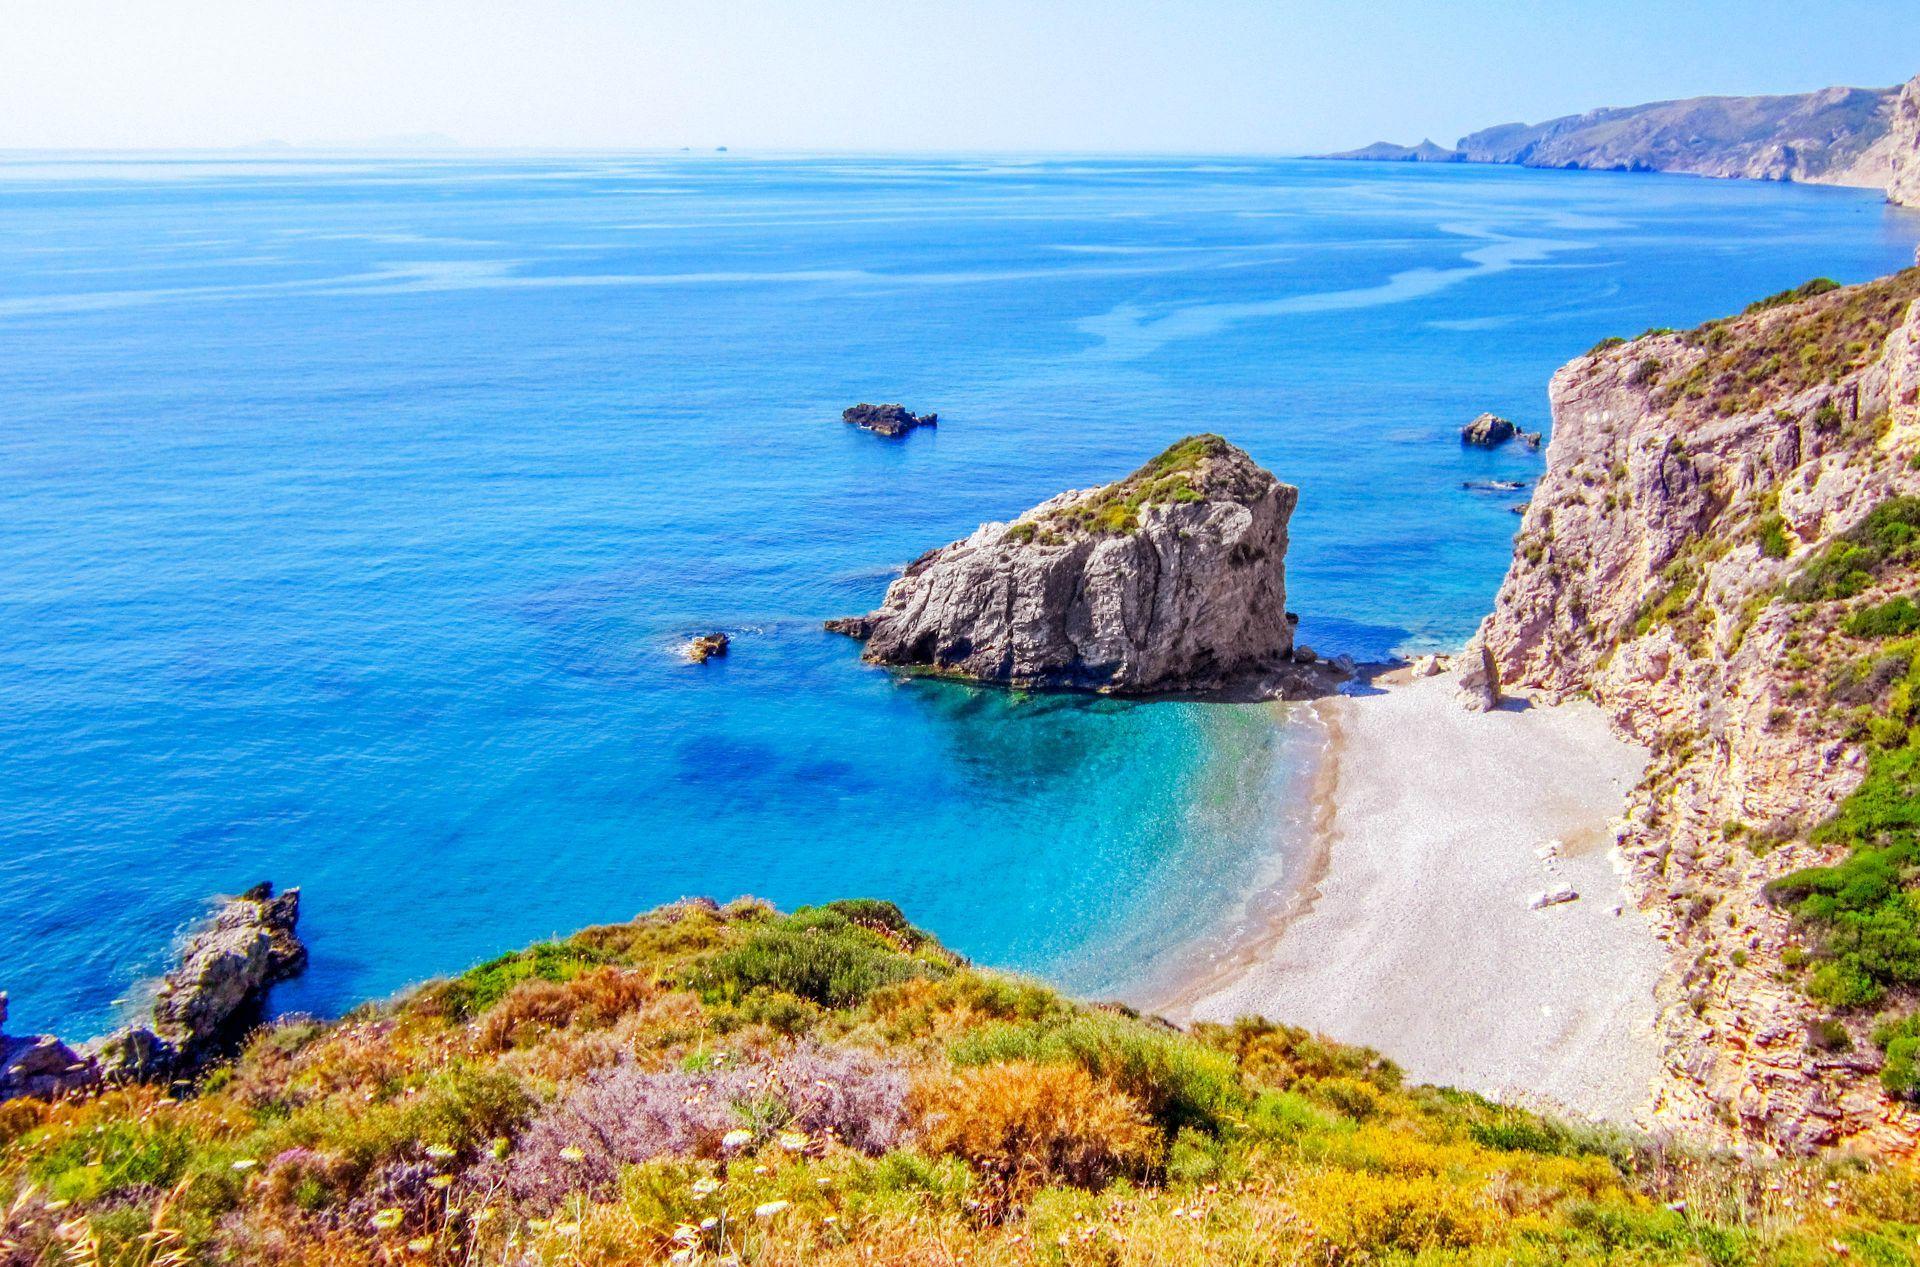 Kythira island: Kaladi beach